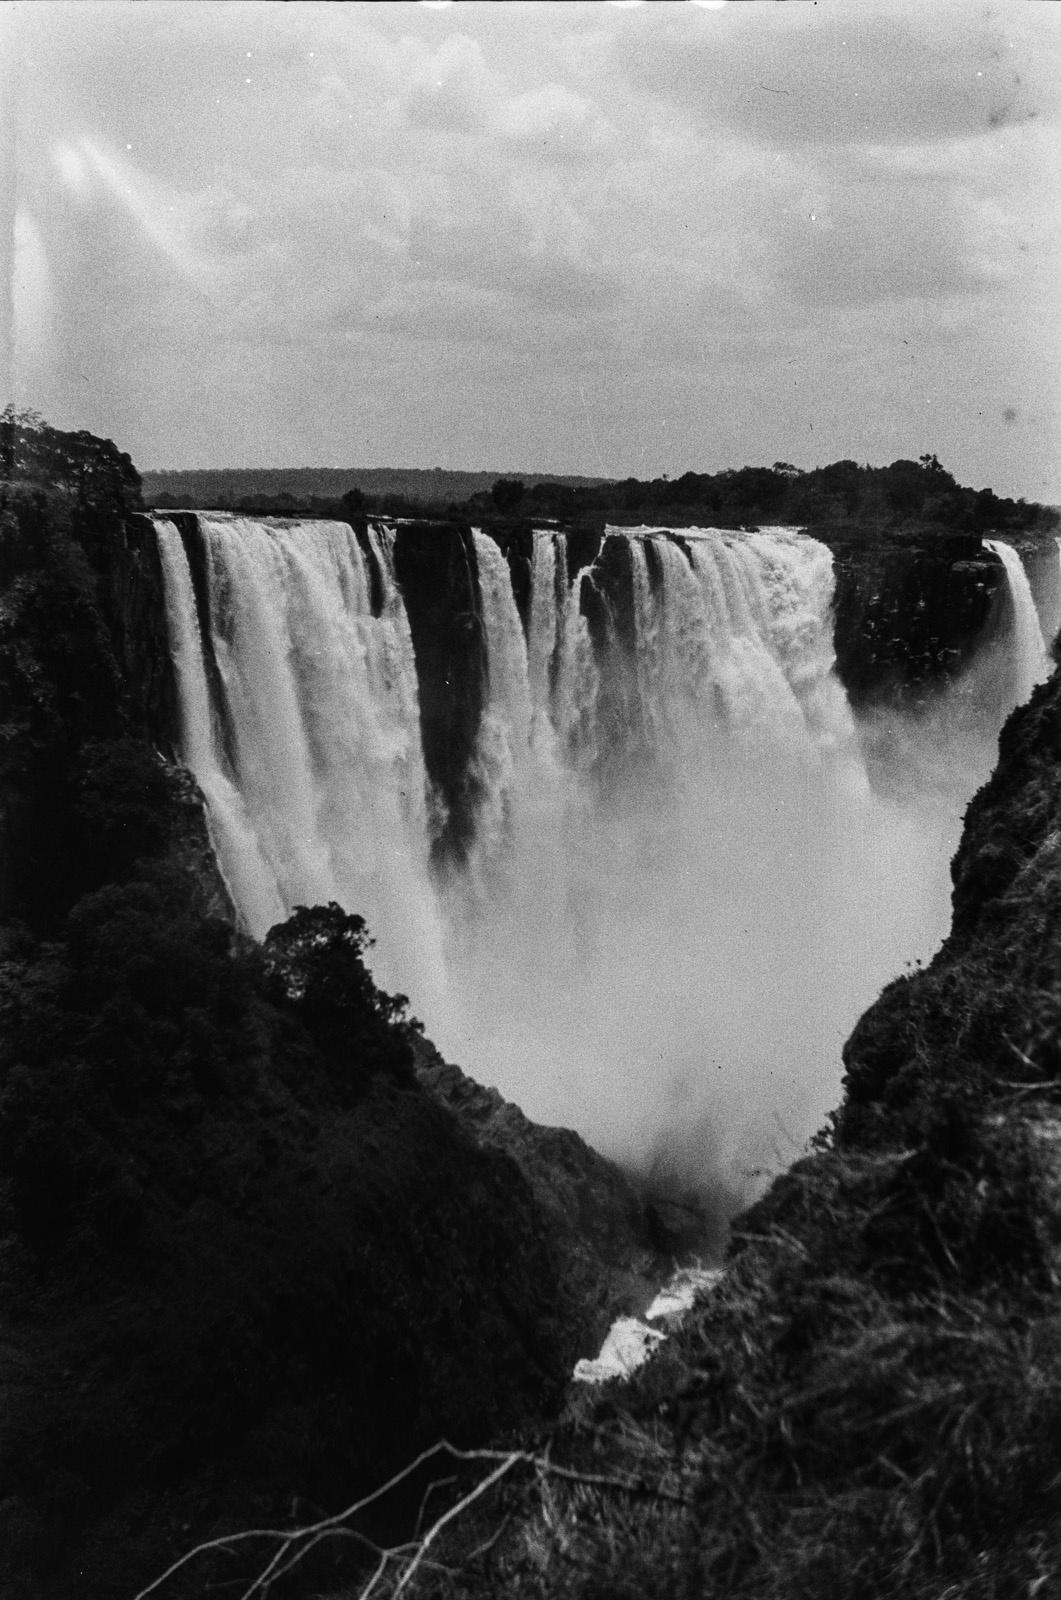 Водопад Виктория реки Замбези. Северная часть